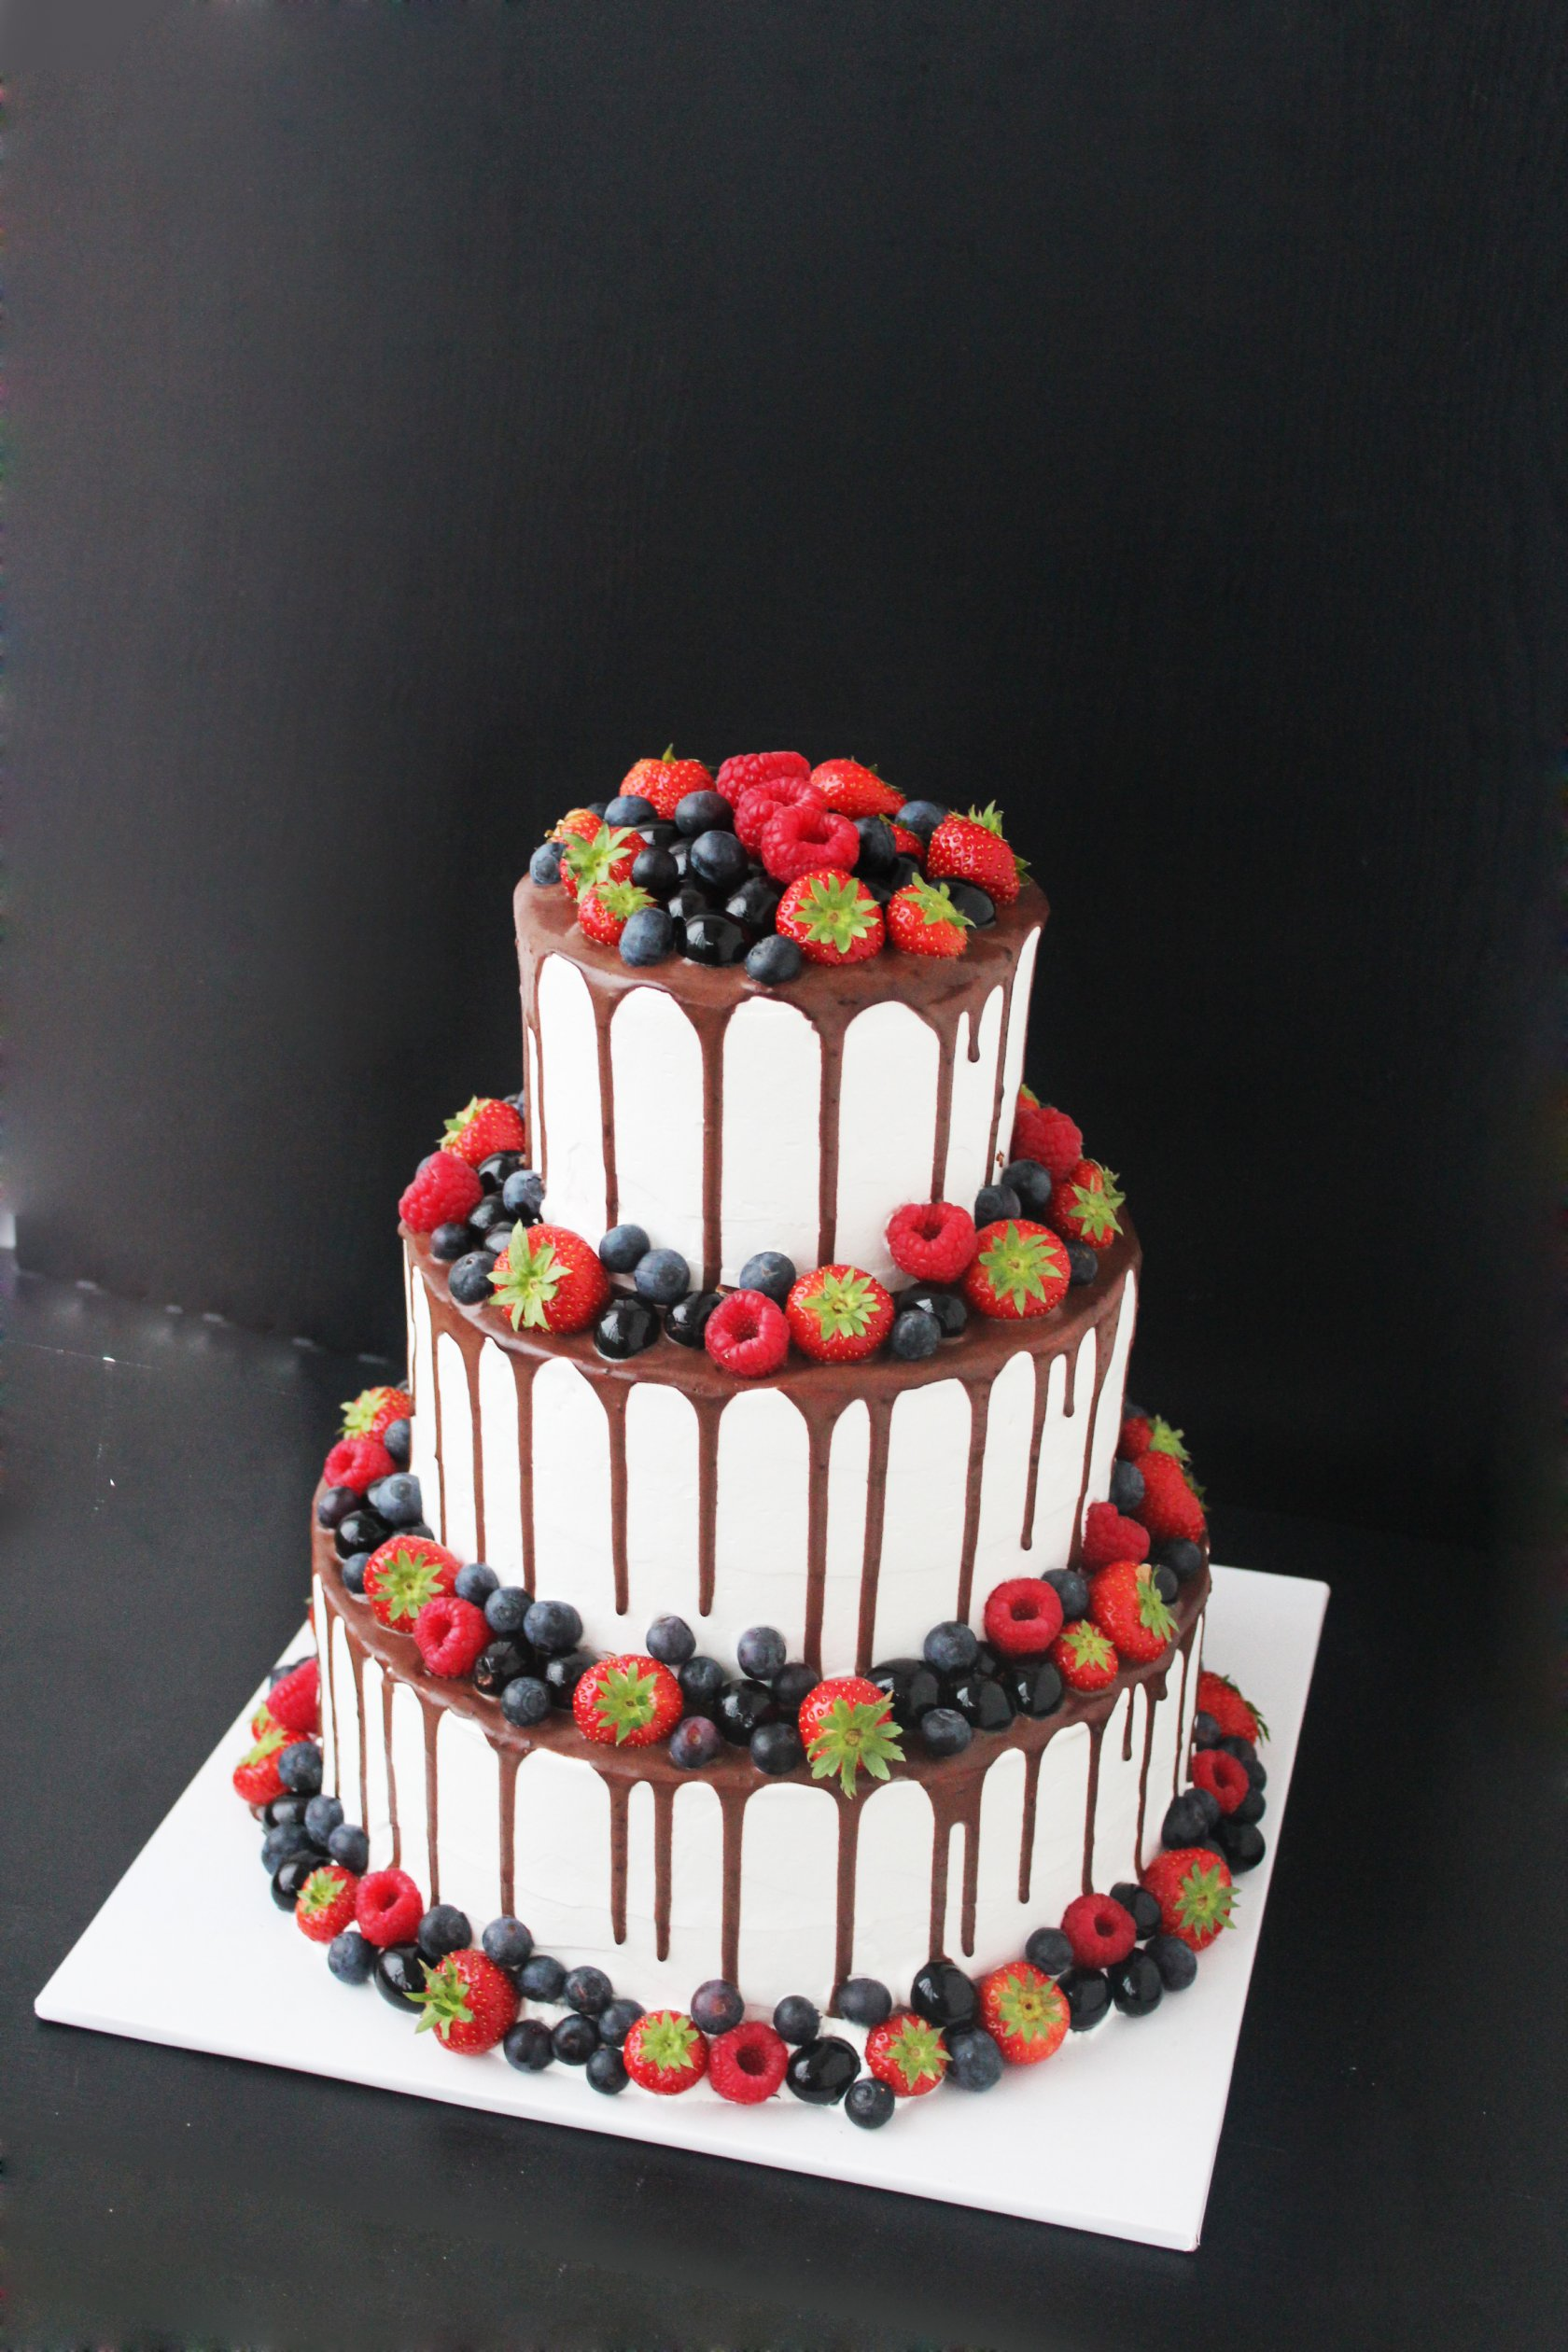 Папе днем, картинки свадебного торта без мастики